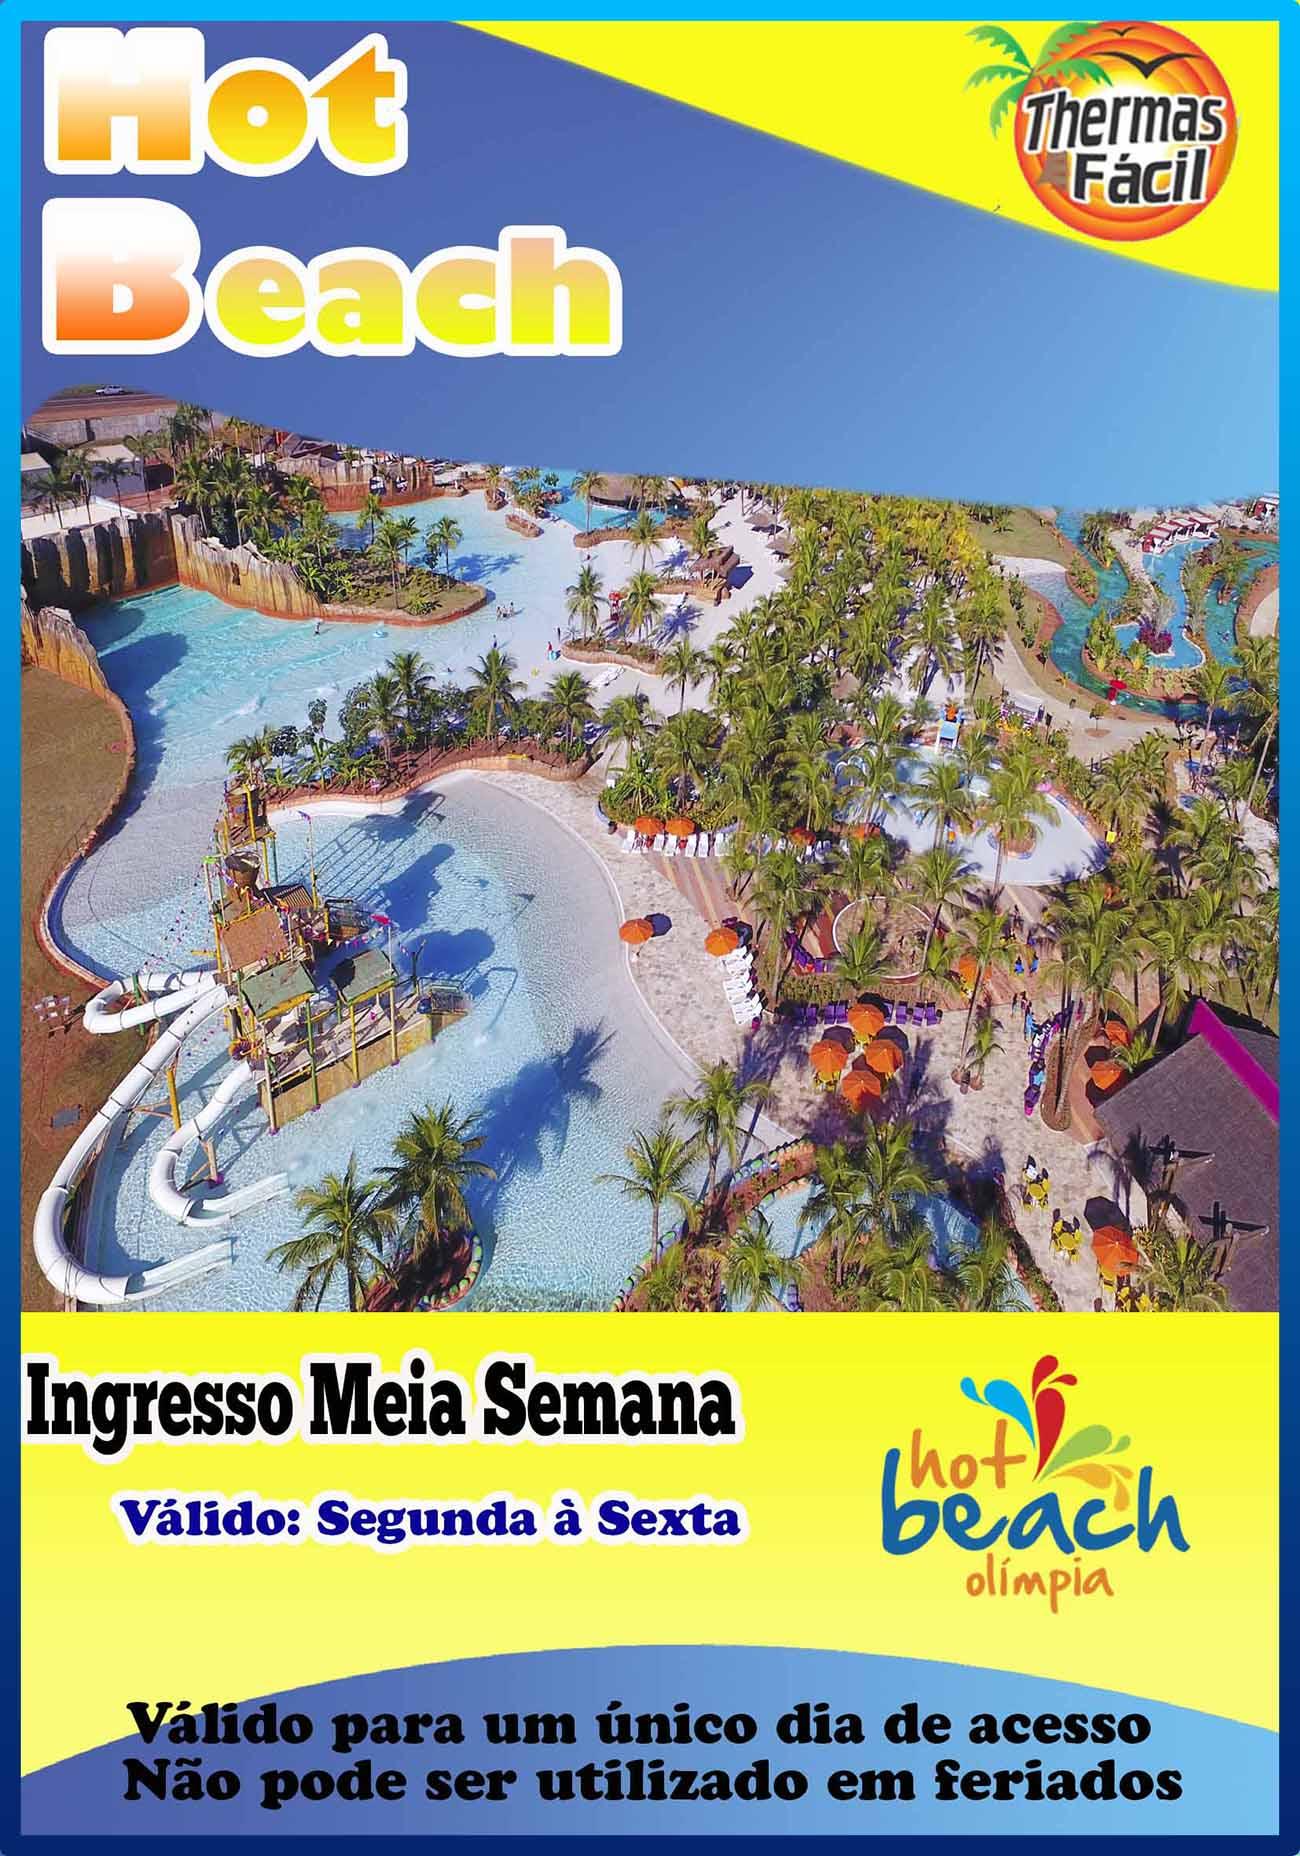 Ingresso Meia - Semana - Hot Beach  - Thermas Fácil